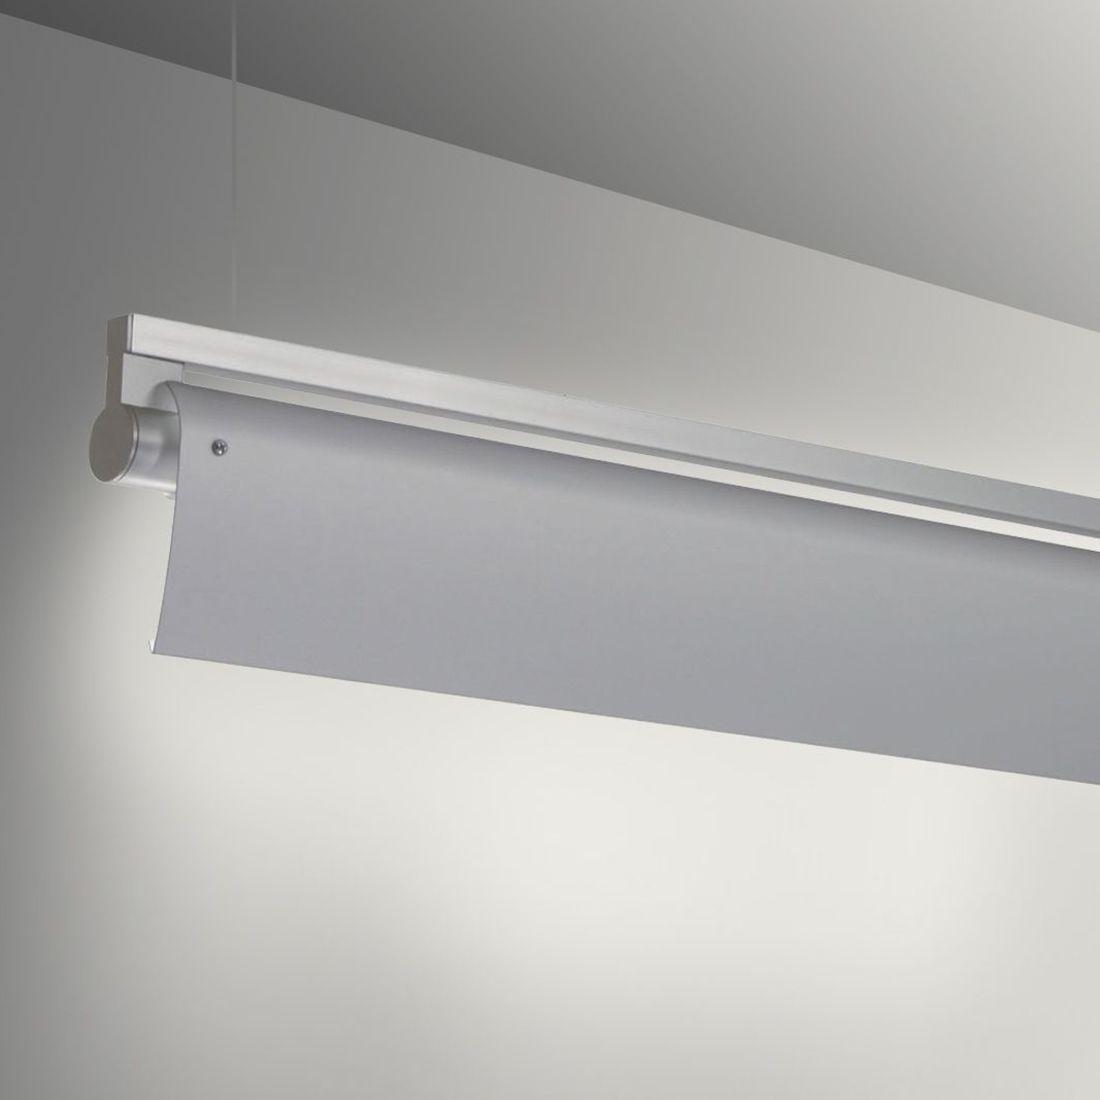 Alcon Gladstone 12160 P Ww Adjustable Led Pendant Light Fixture Wall Wash